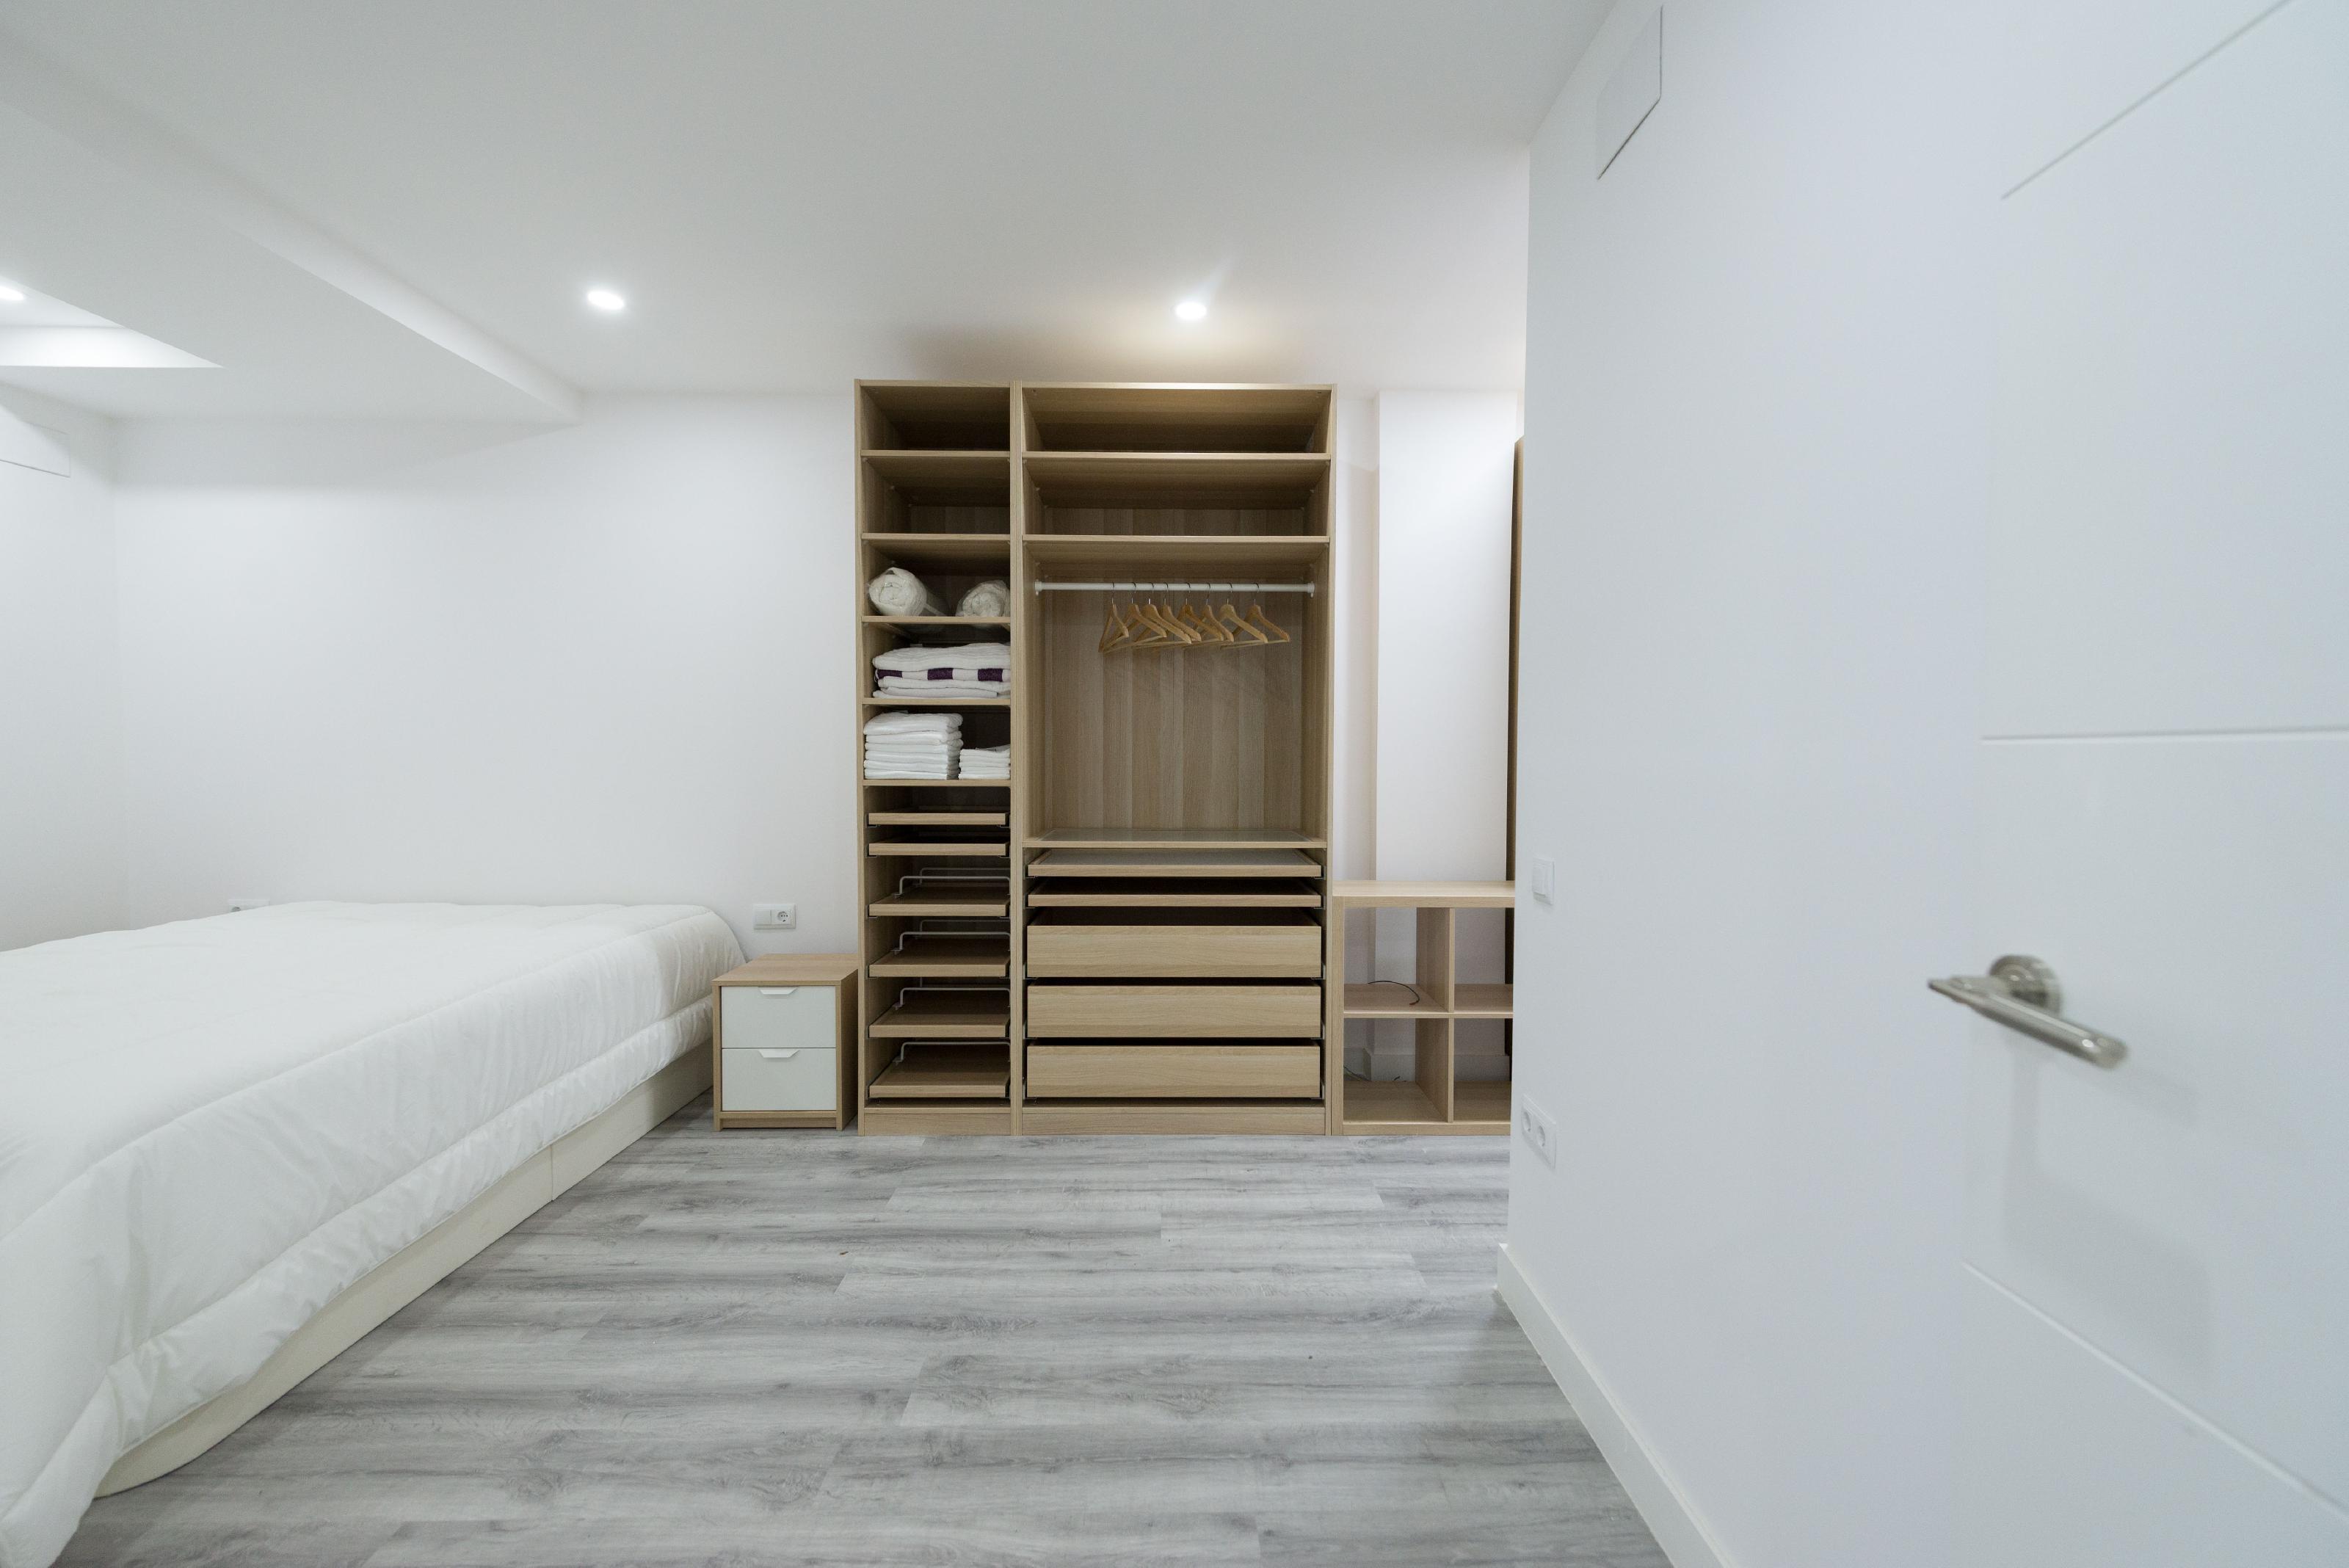 242980 Flat for sale in Eixample, Sagrada Familia 15